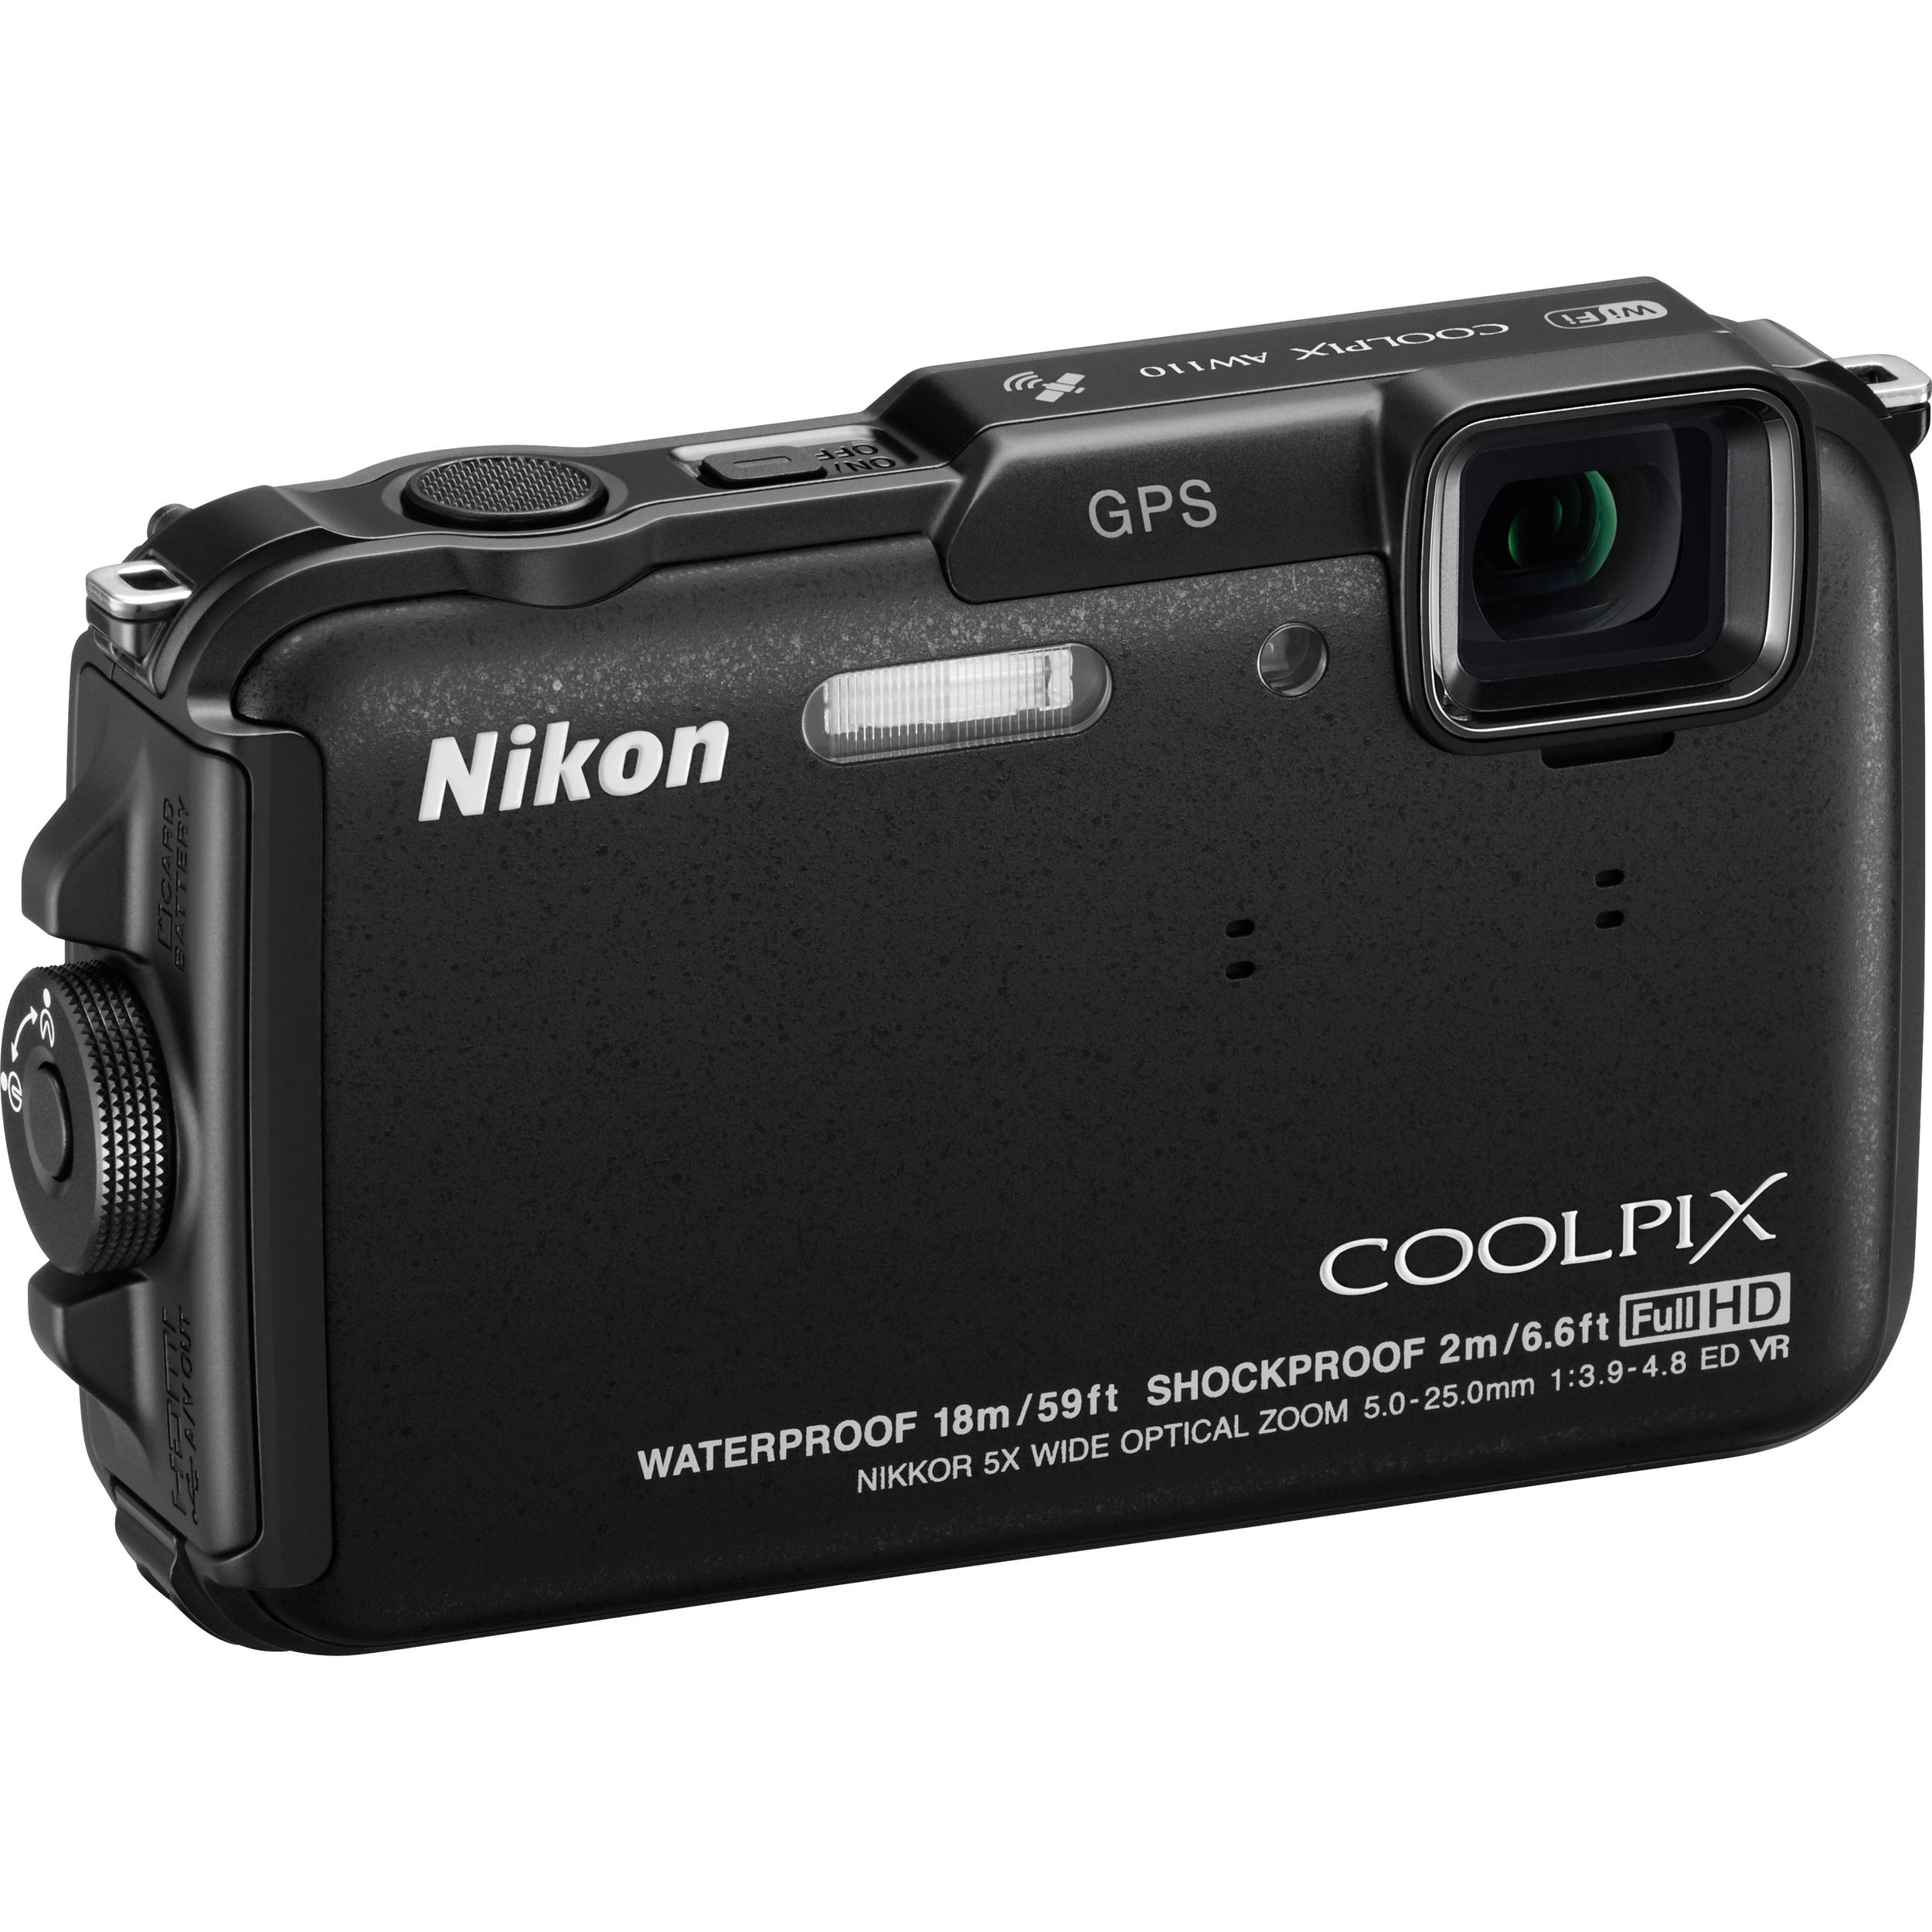 nikon coolpix aw110 digital camera black 26410 b h photo video rh bhphotovideo com coolpix aw110 manual coolpix aw110 manual